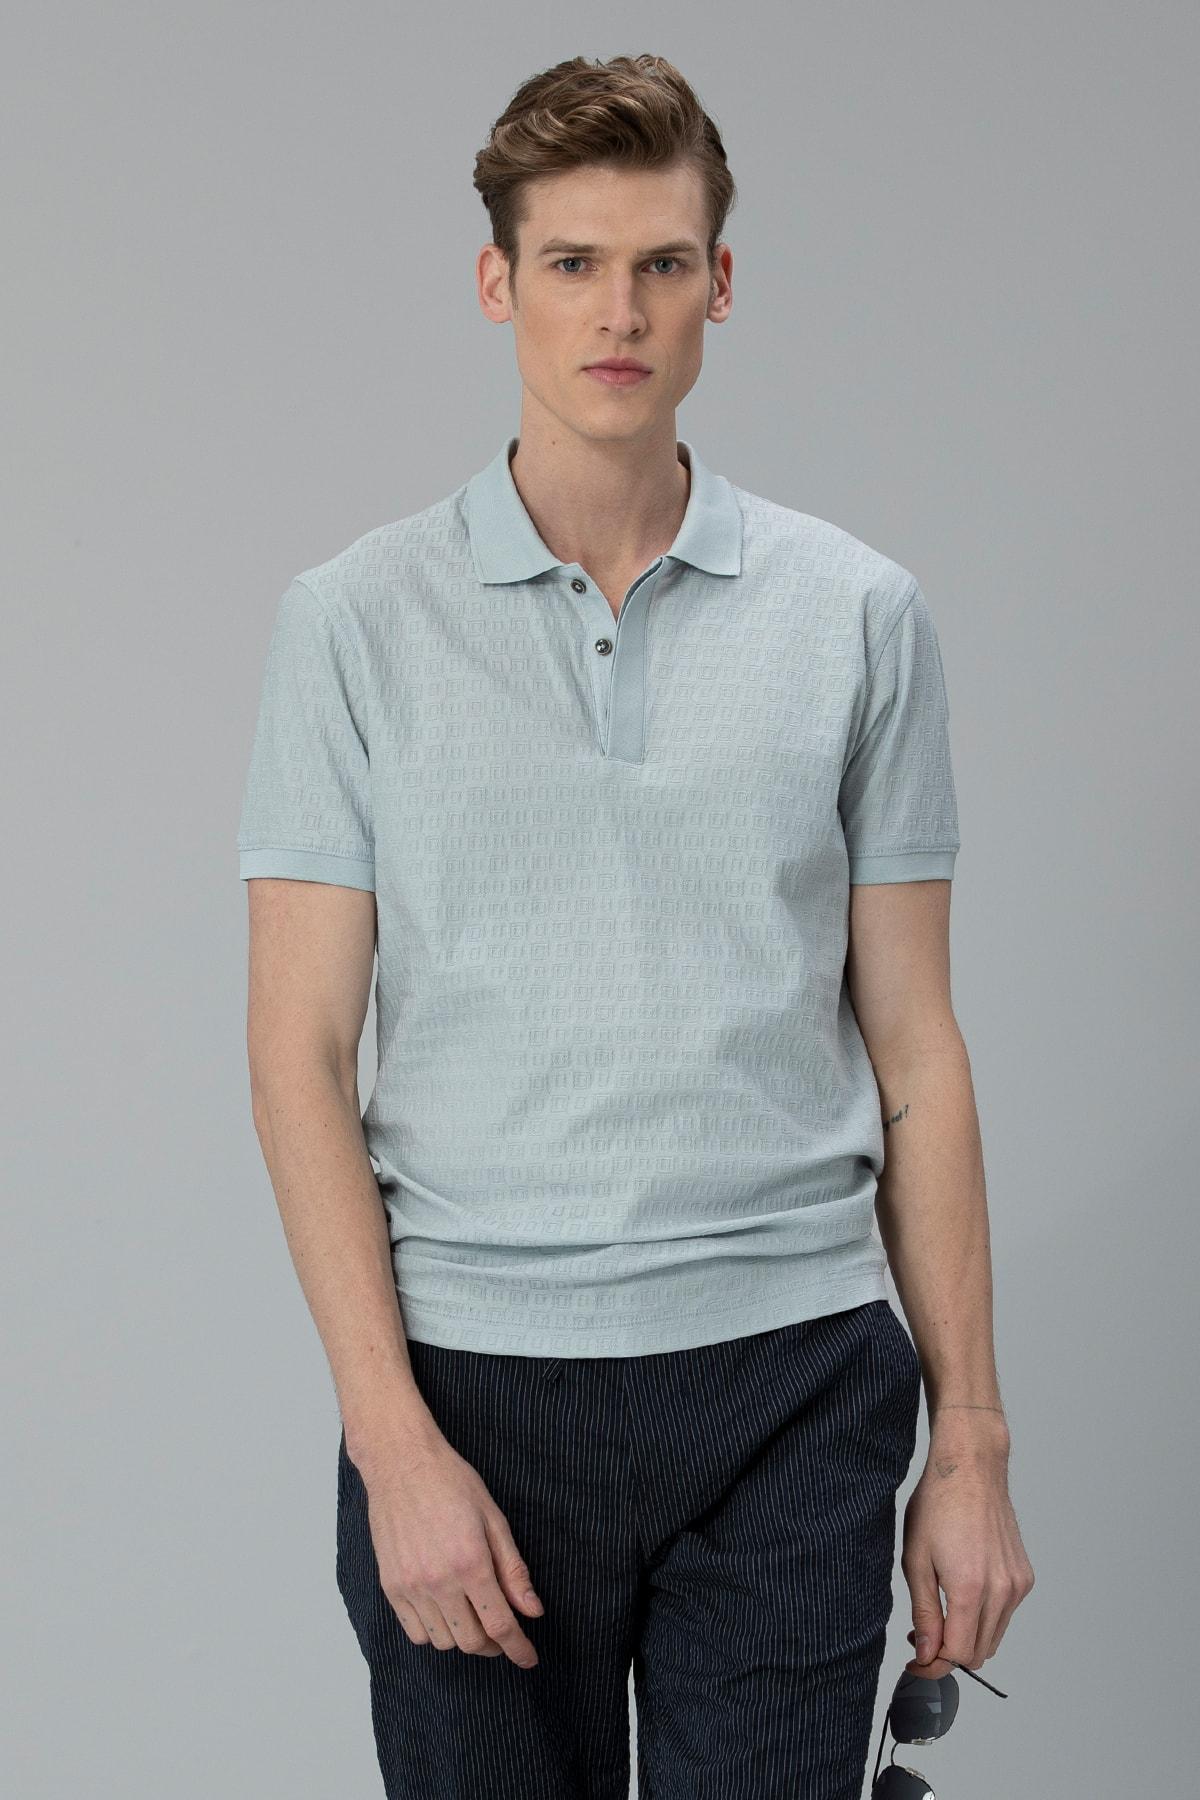 Lufian Clar Spor Polo T- Shirt Açık Nane 3